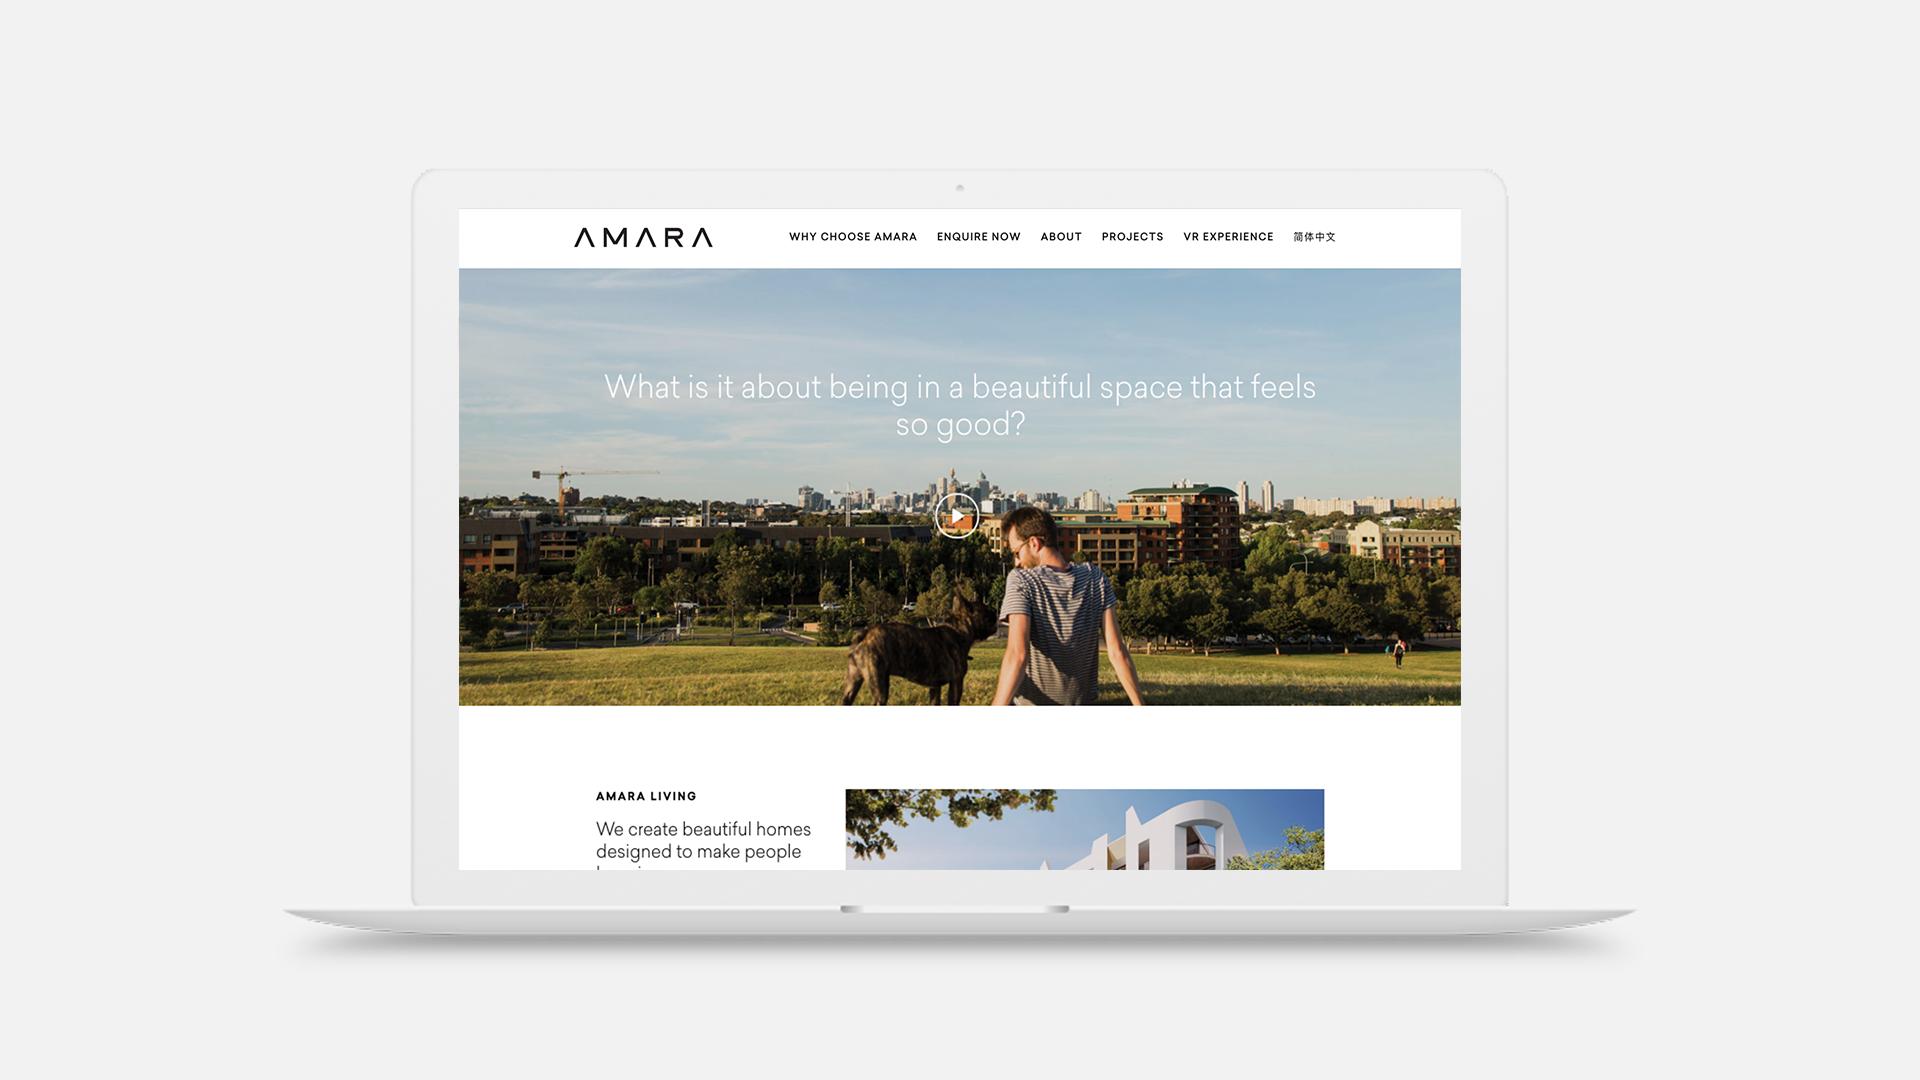 Amara_home.png